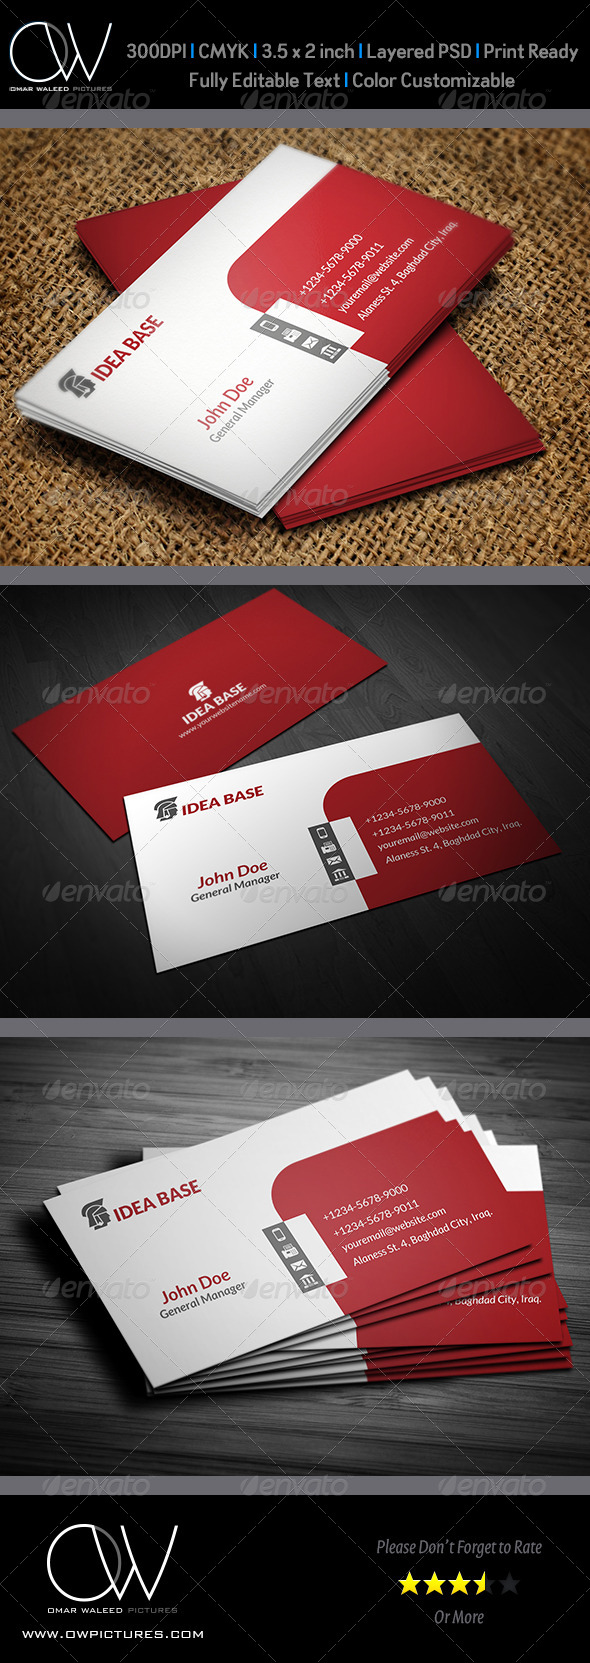 Corporate Business Card Template Vol.32 - Corporate Business Cards